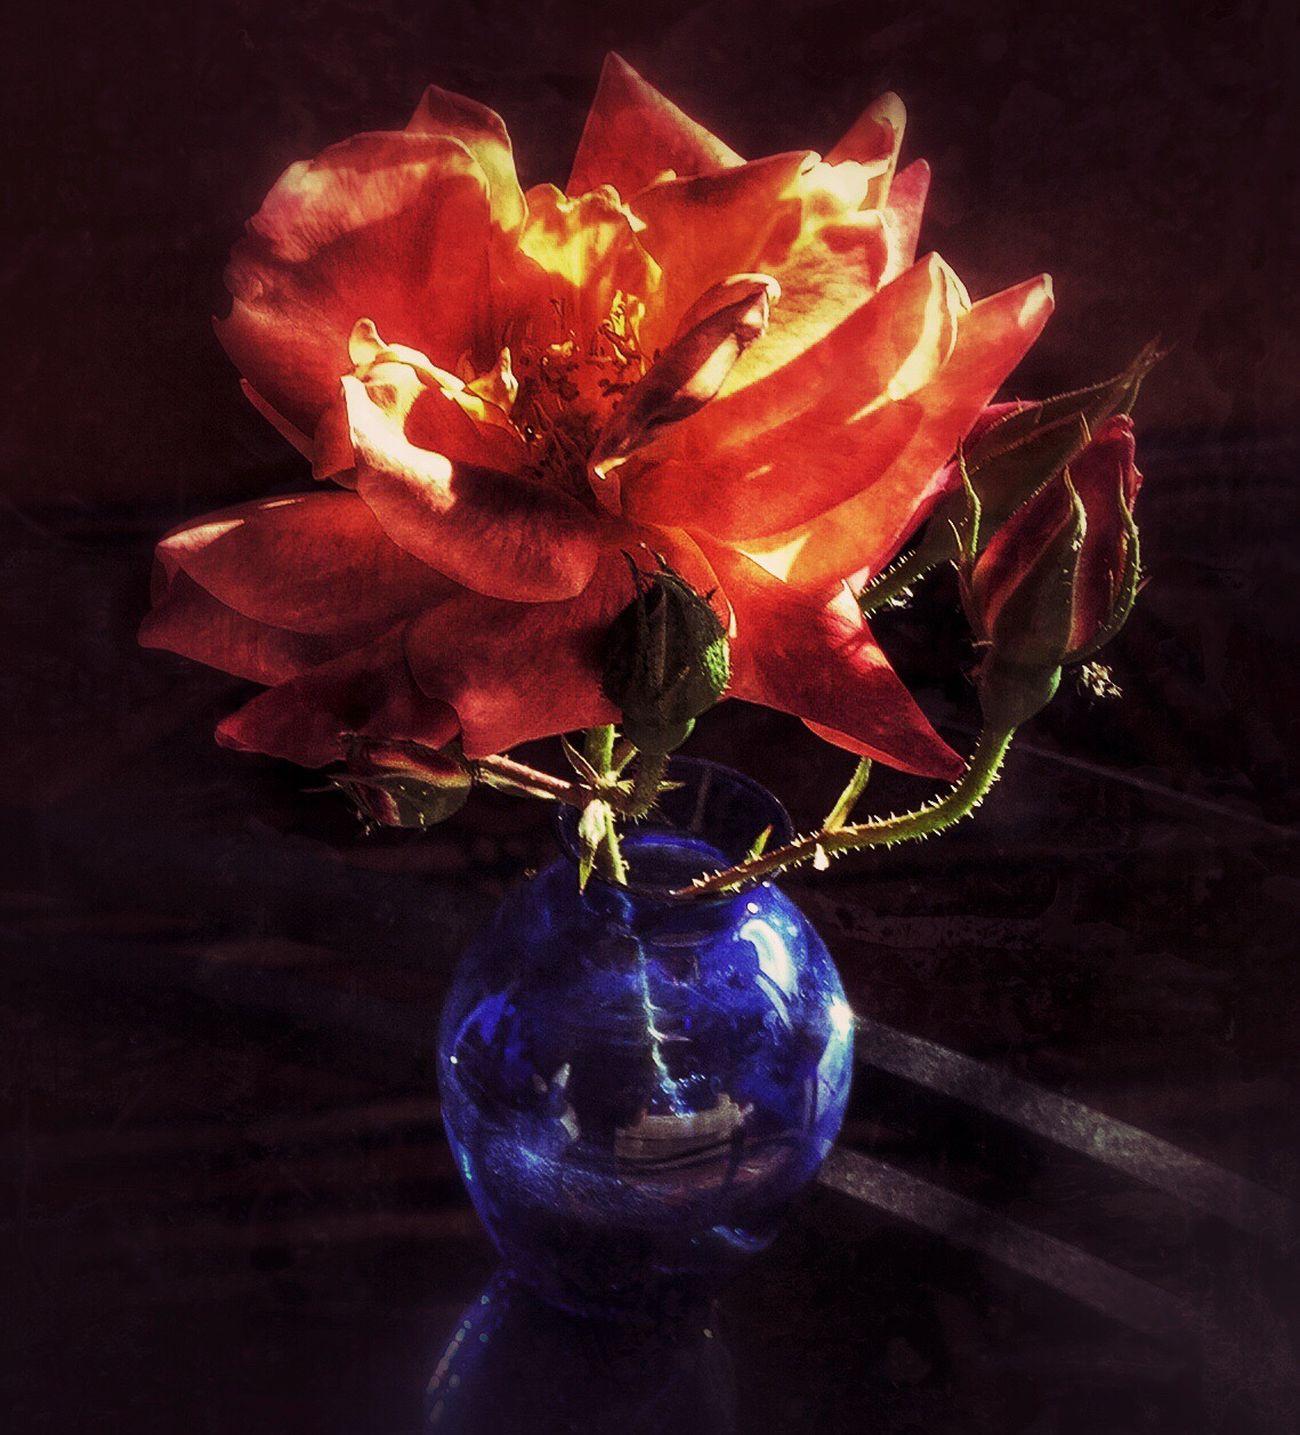 Flower Power 365.2015 Ifollowedtheyellowbrickroadtoday Shadows & Lights